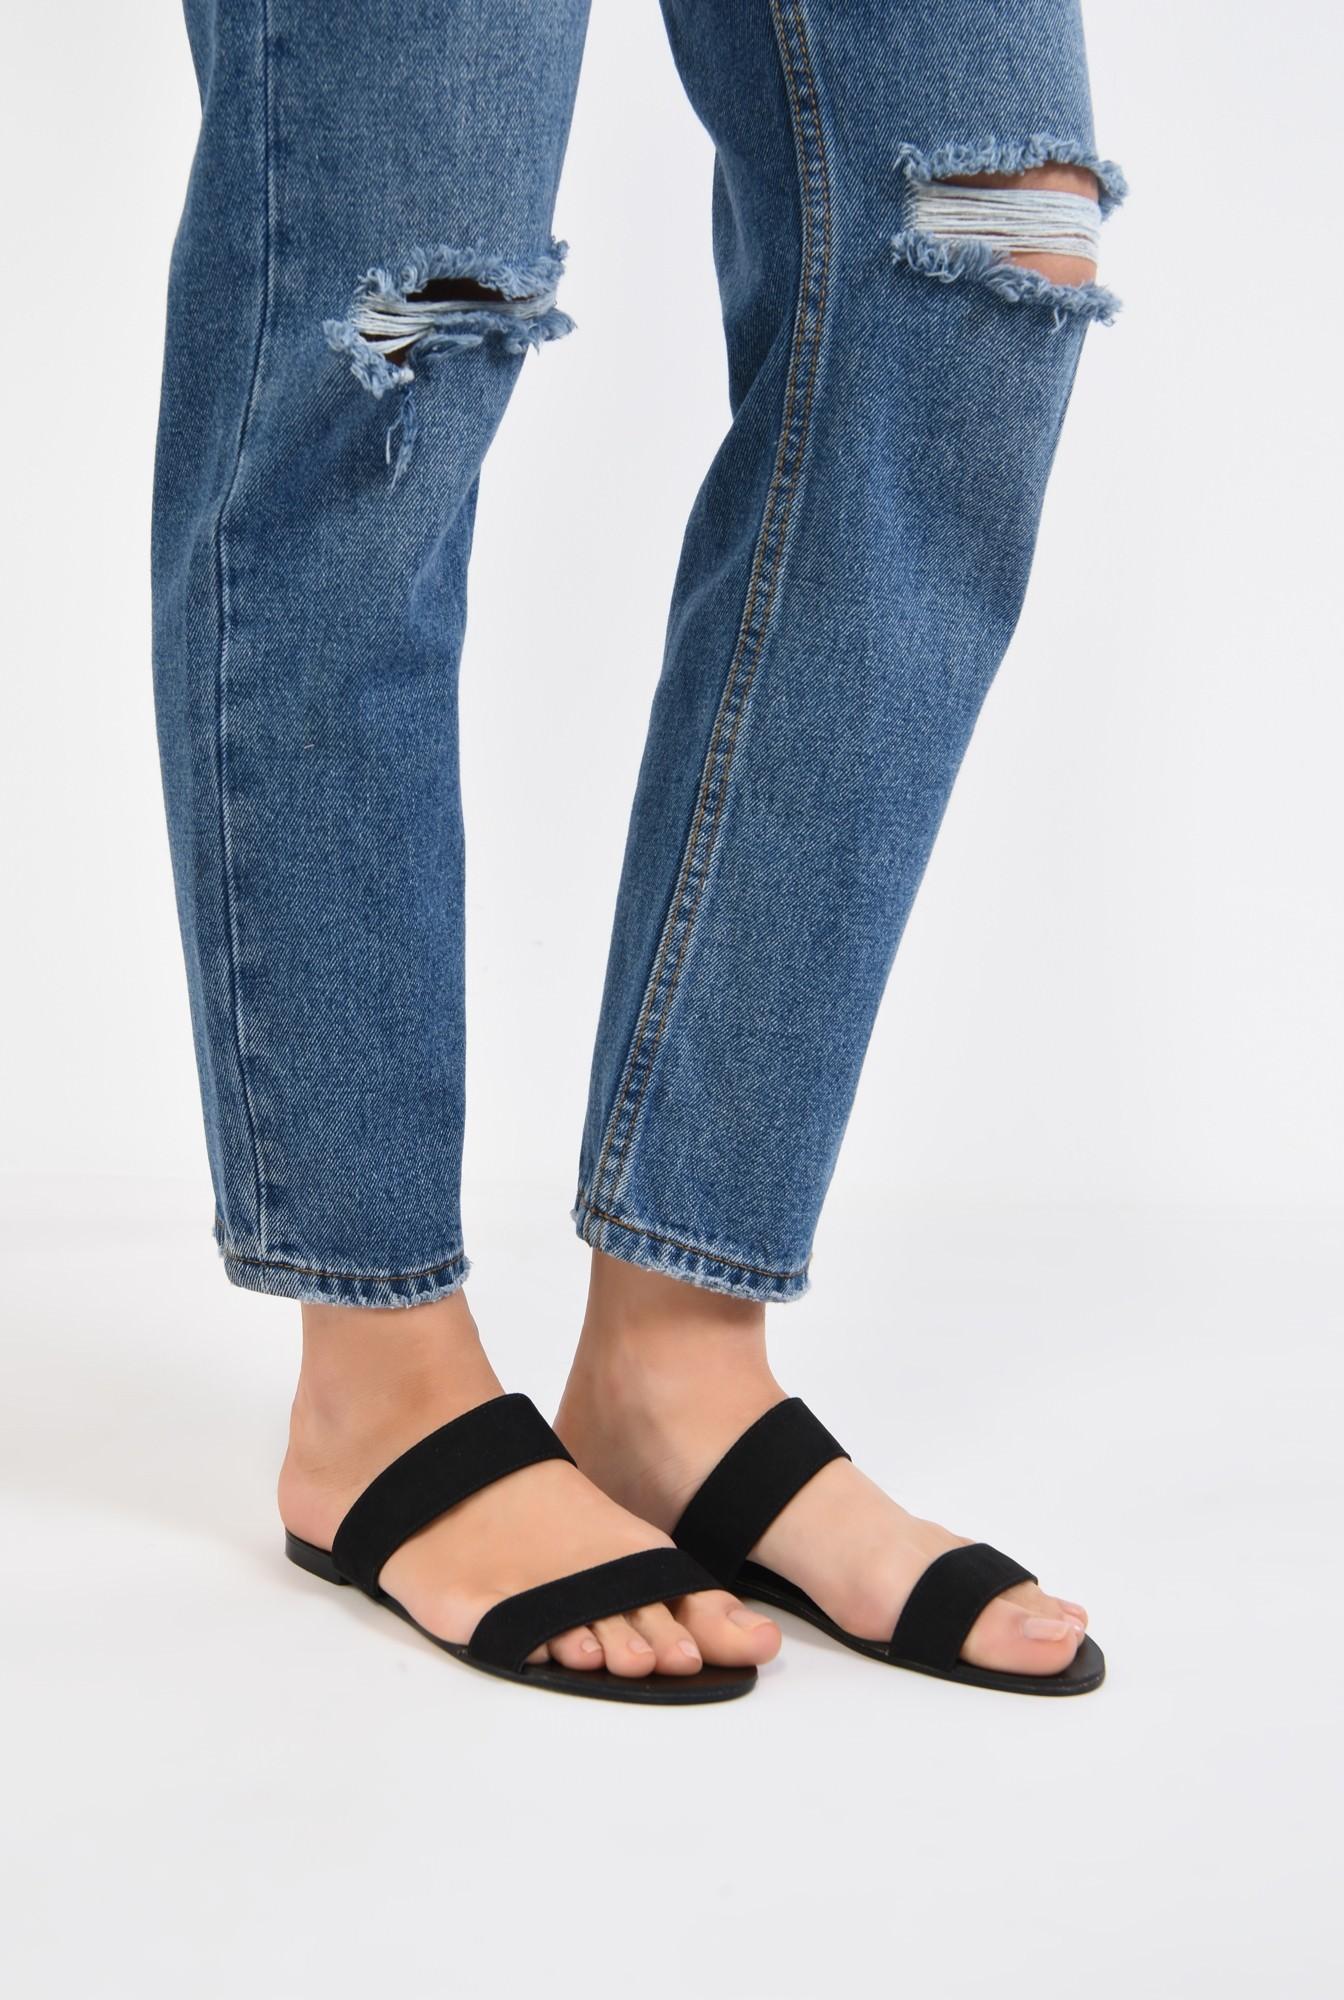 4 - papuci din velur, negru, talpa joasa, barete late